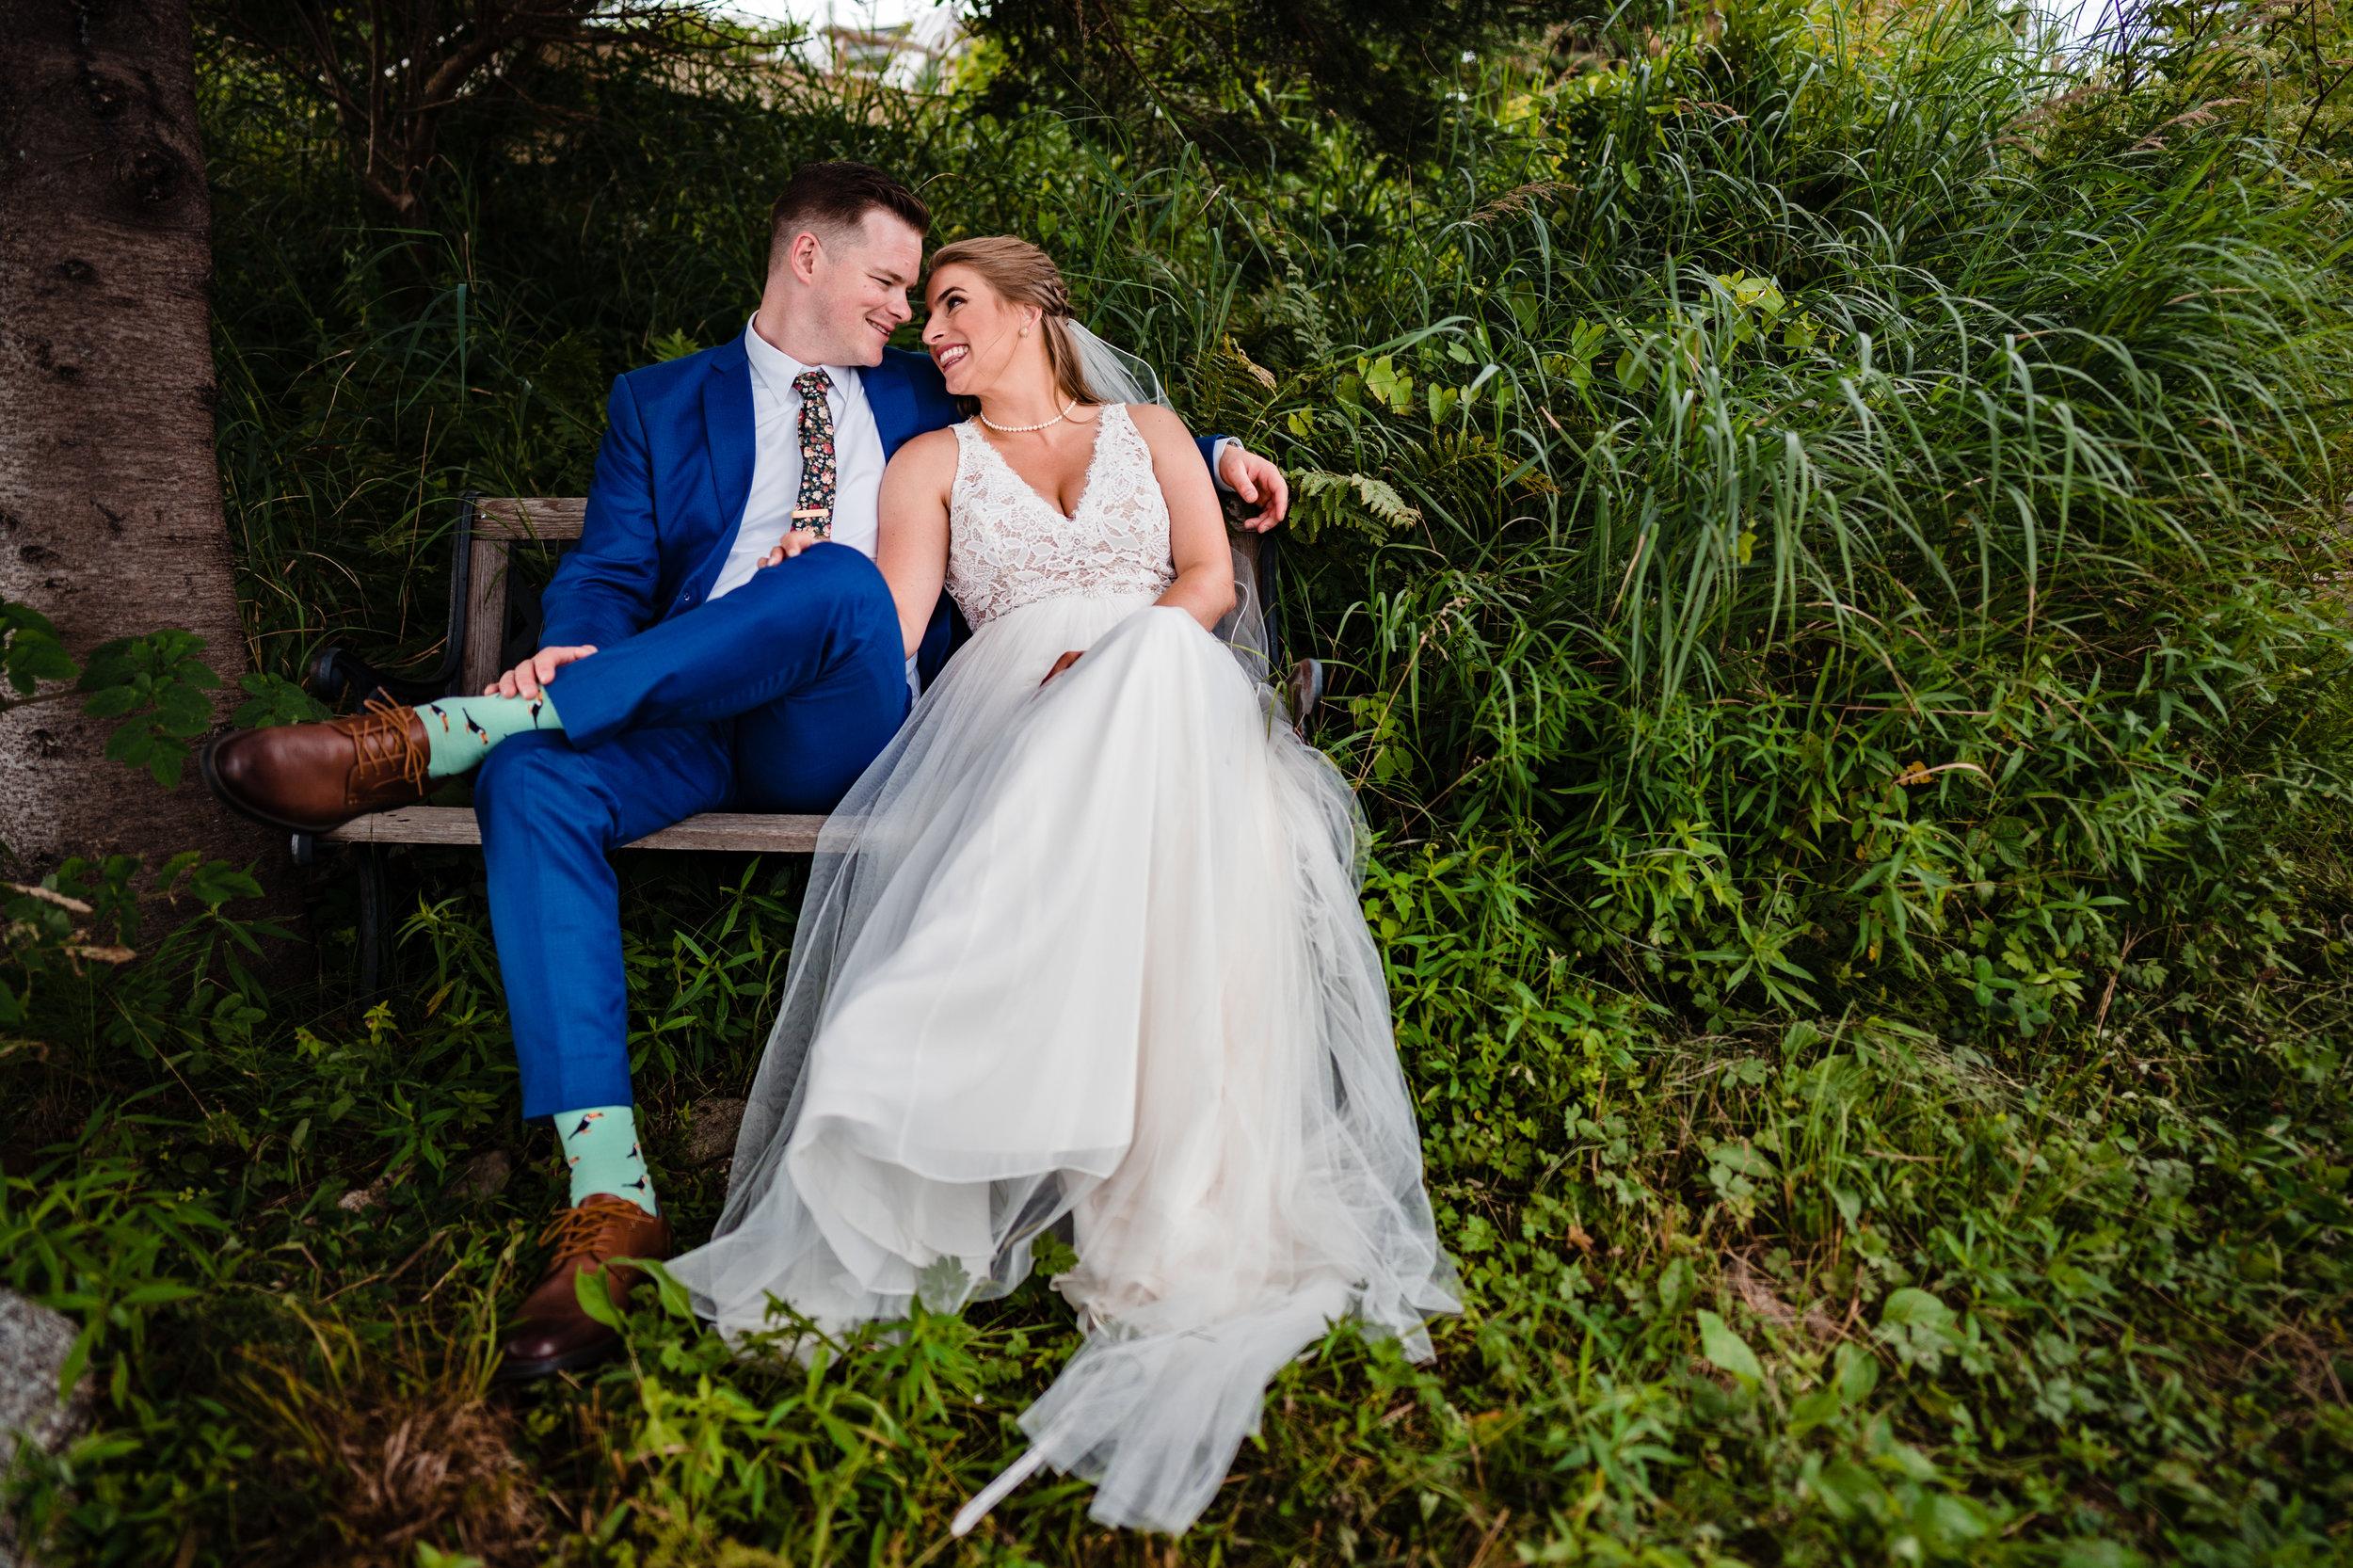 Janelle-Mitch-Halifax-Wedding-Nova-Scotia-Photography (71 of 163).jpg